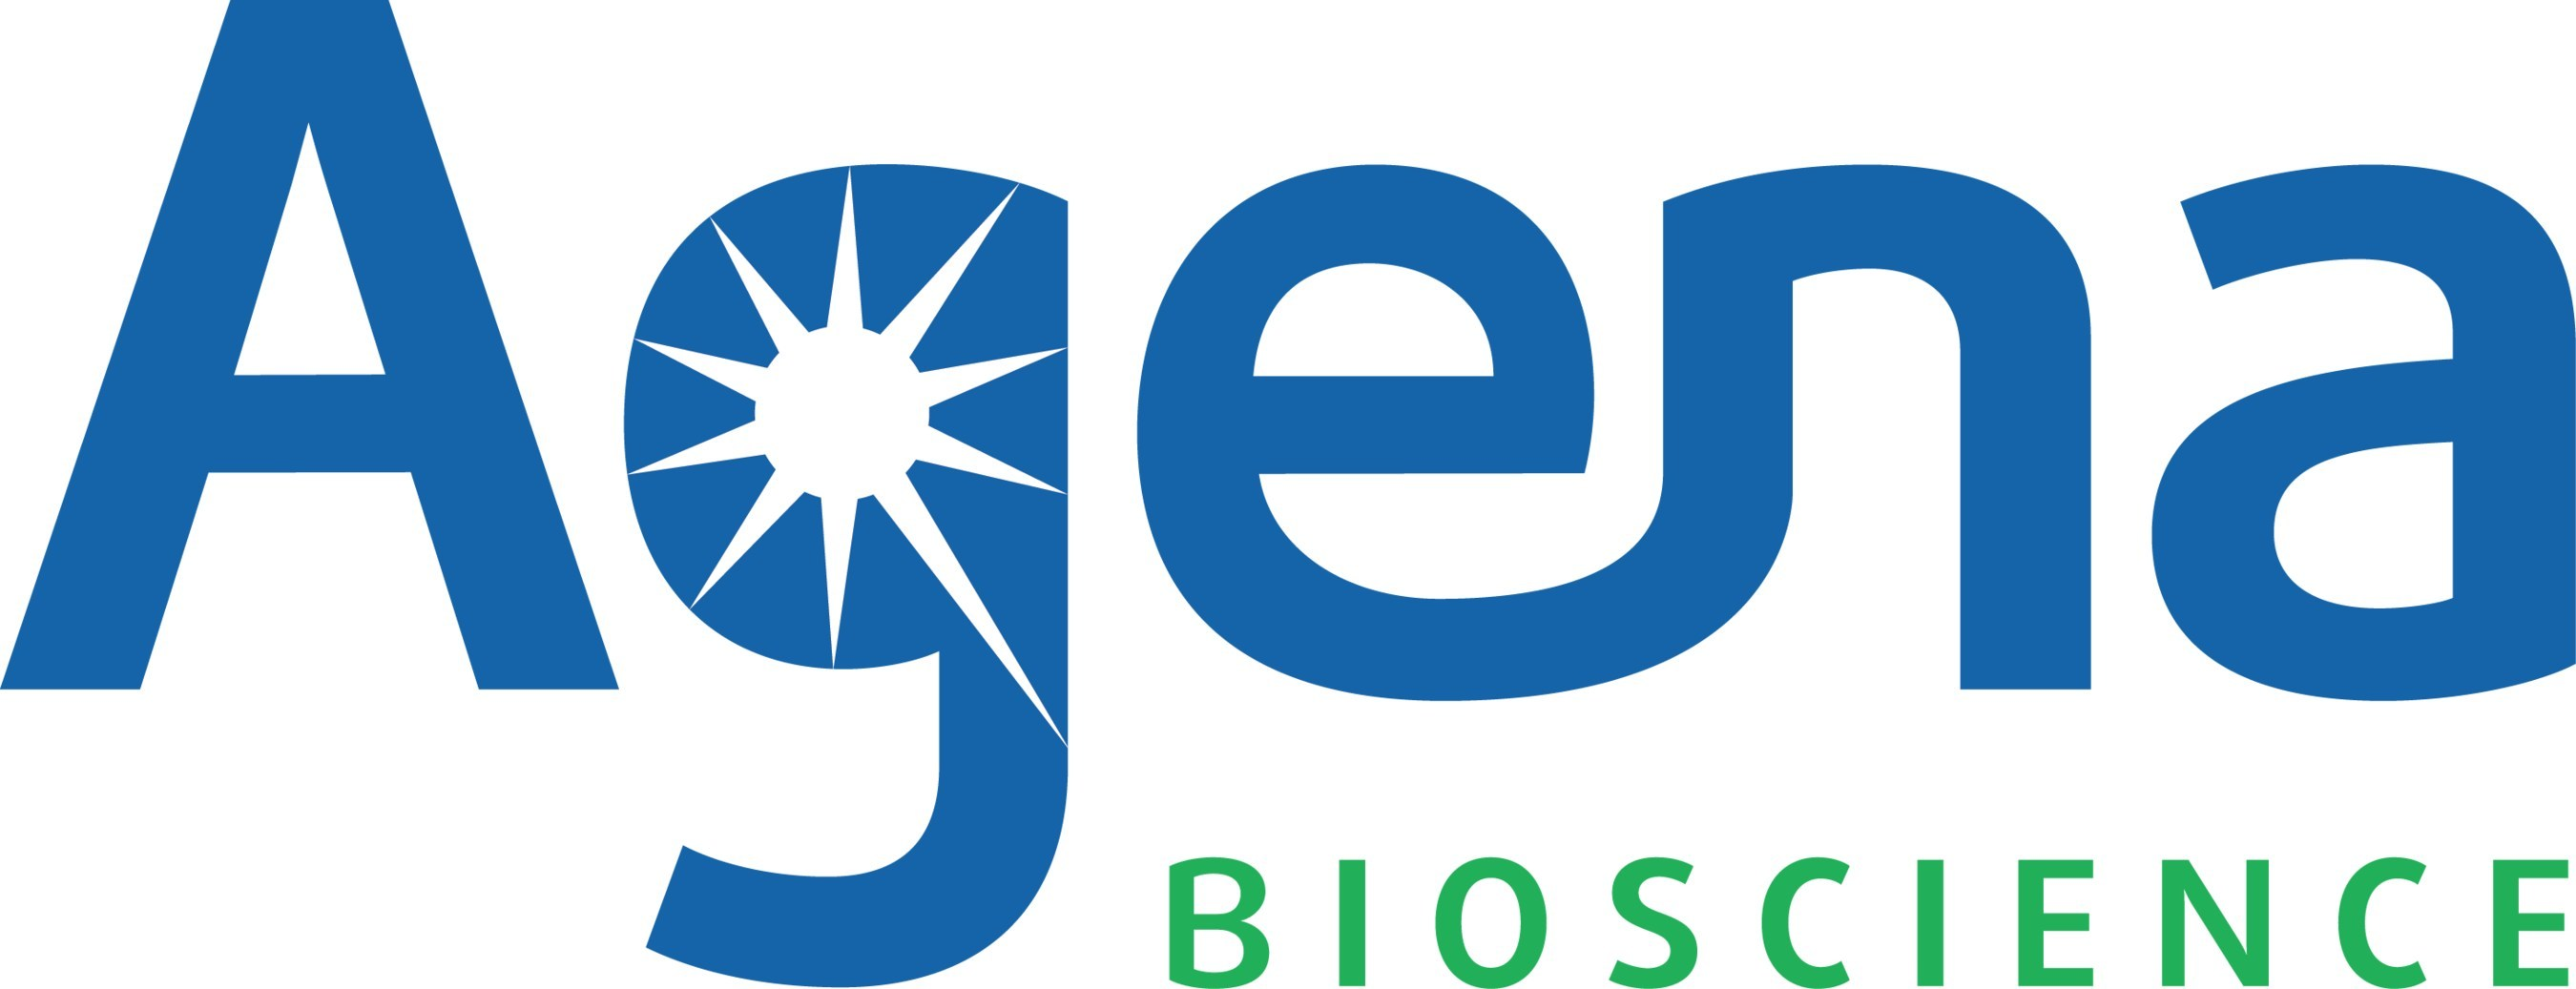 Agena Bioscience